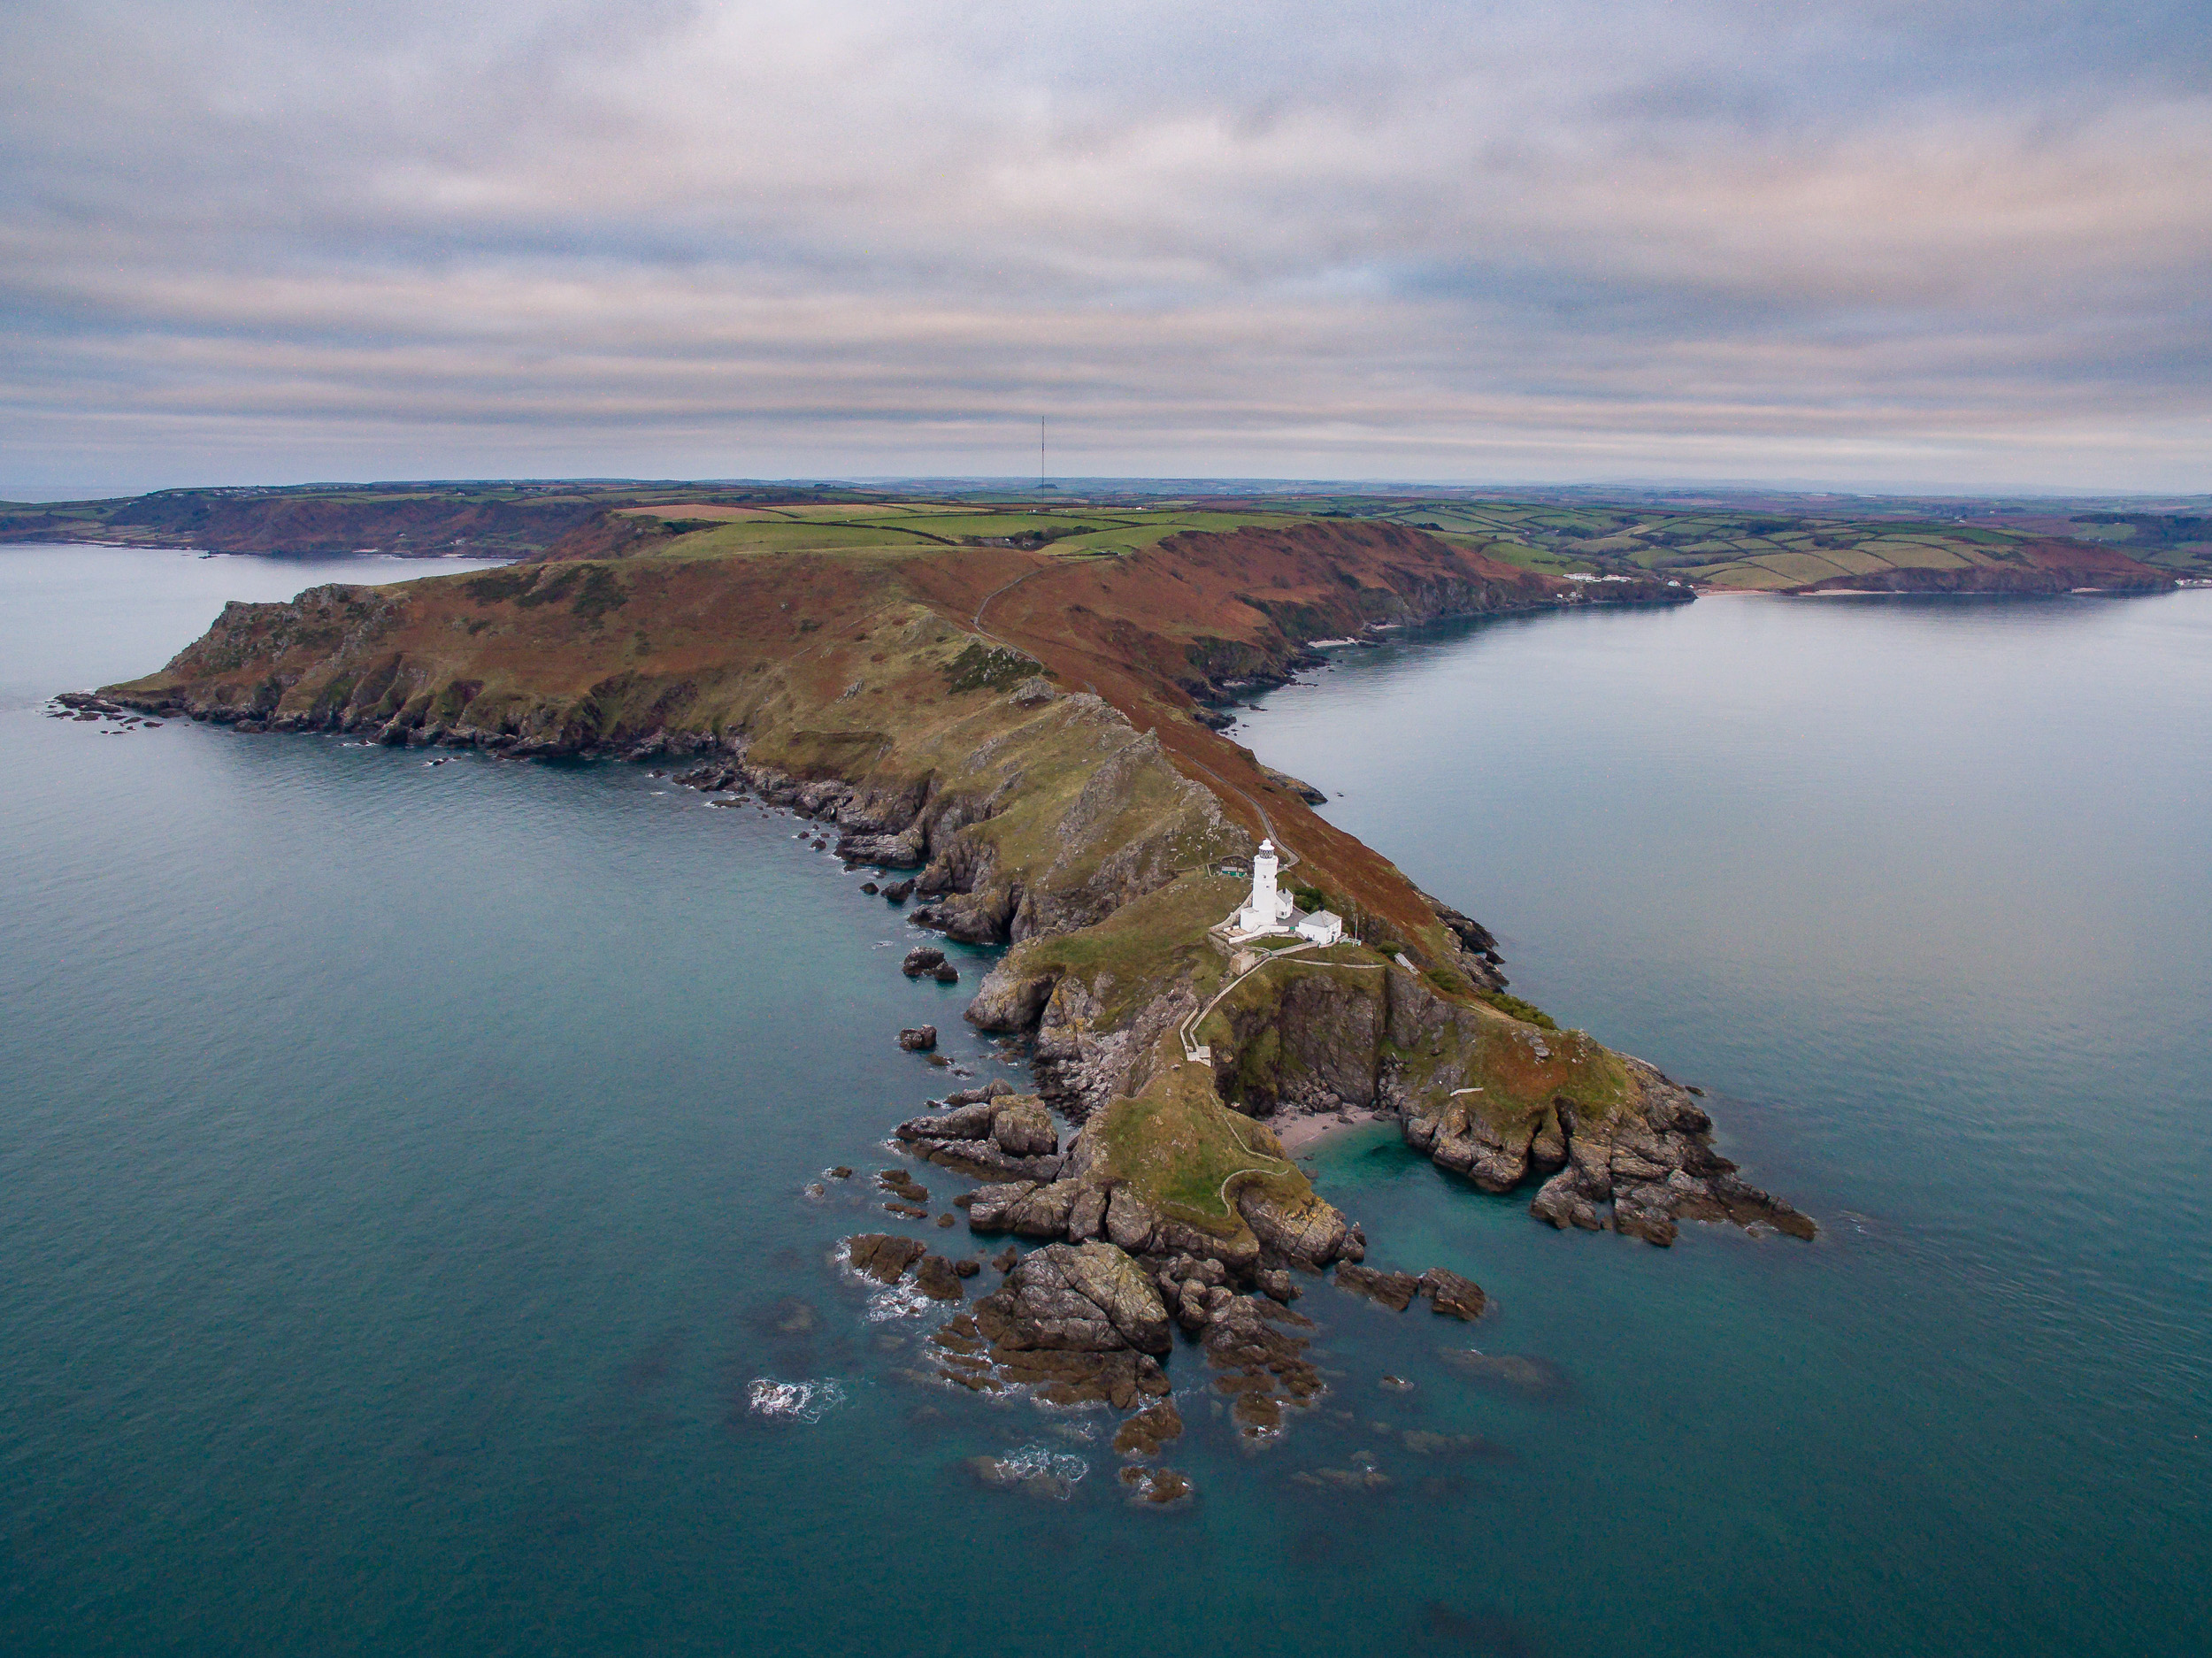 20161028-Start Point Lighthouse from Sea.jpg